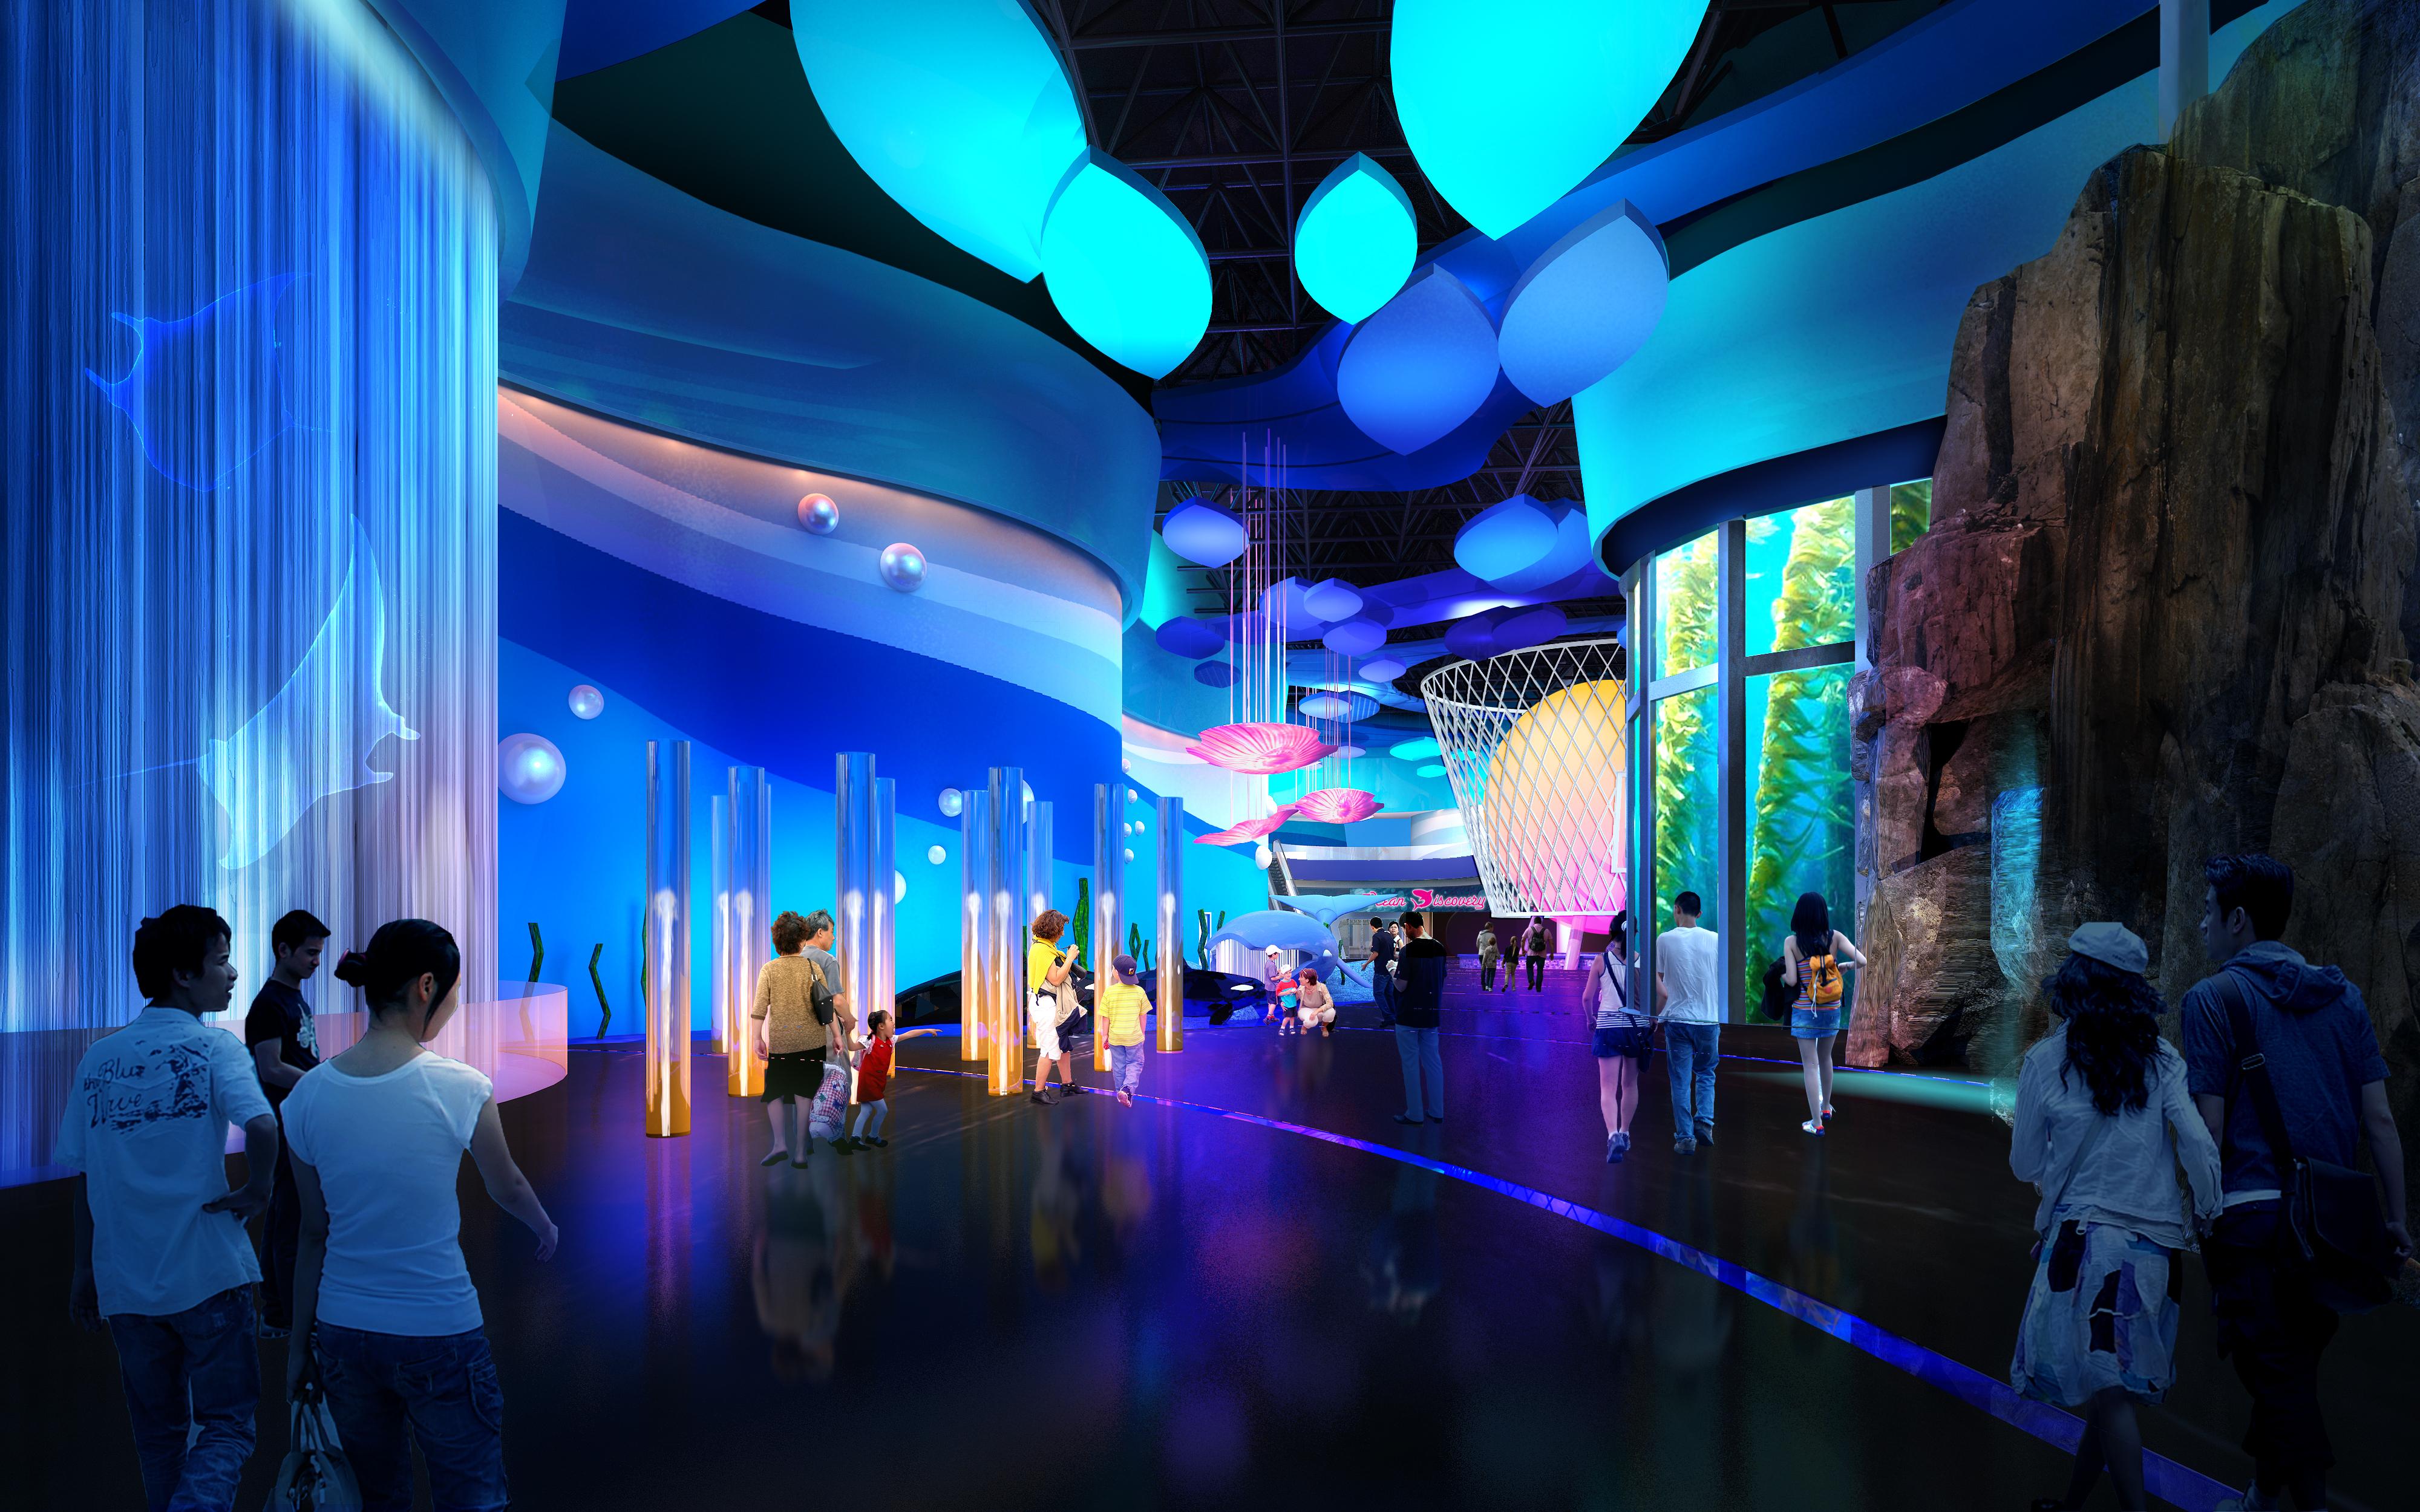 Wanda nanchang ocean world aquarium residential architect tvsdesign nanchang china